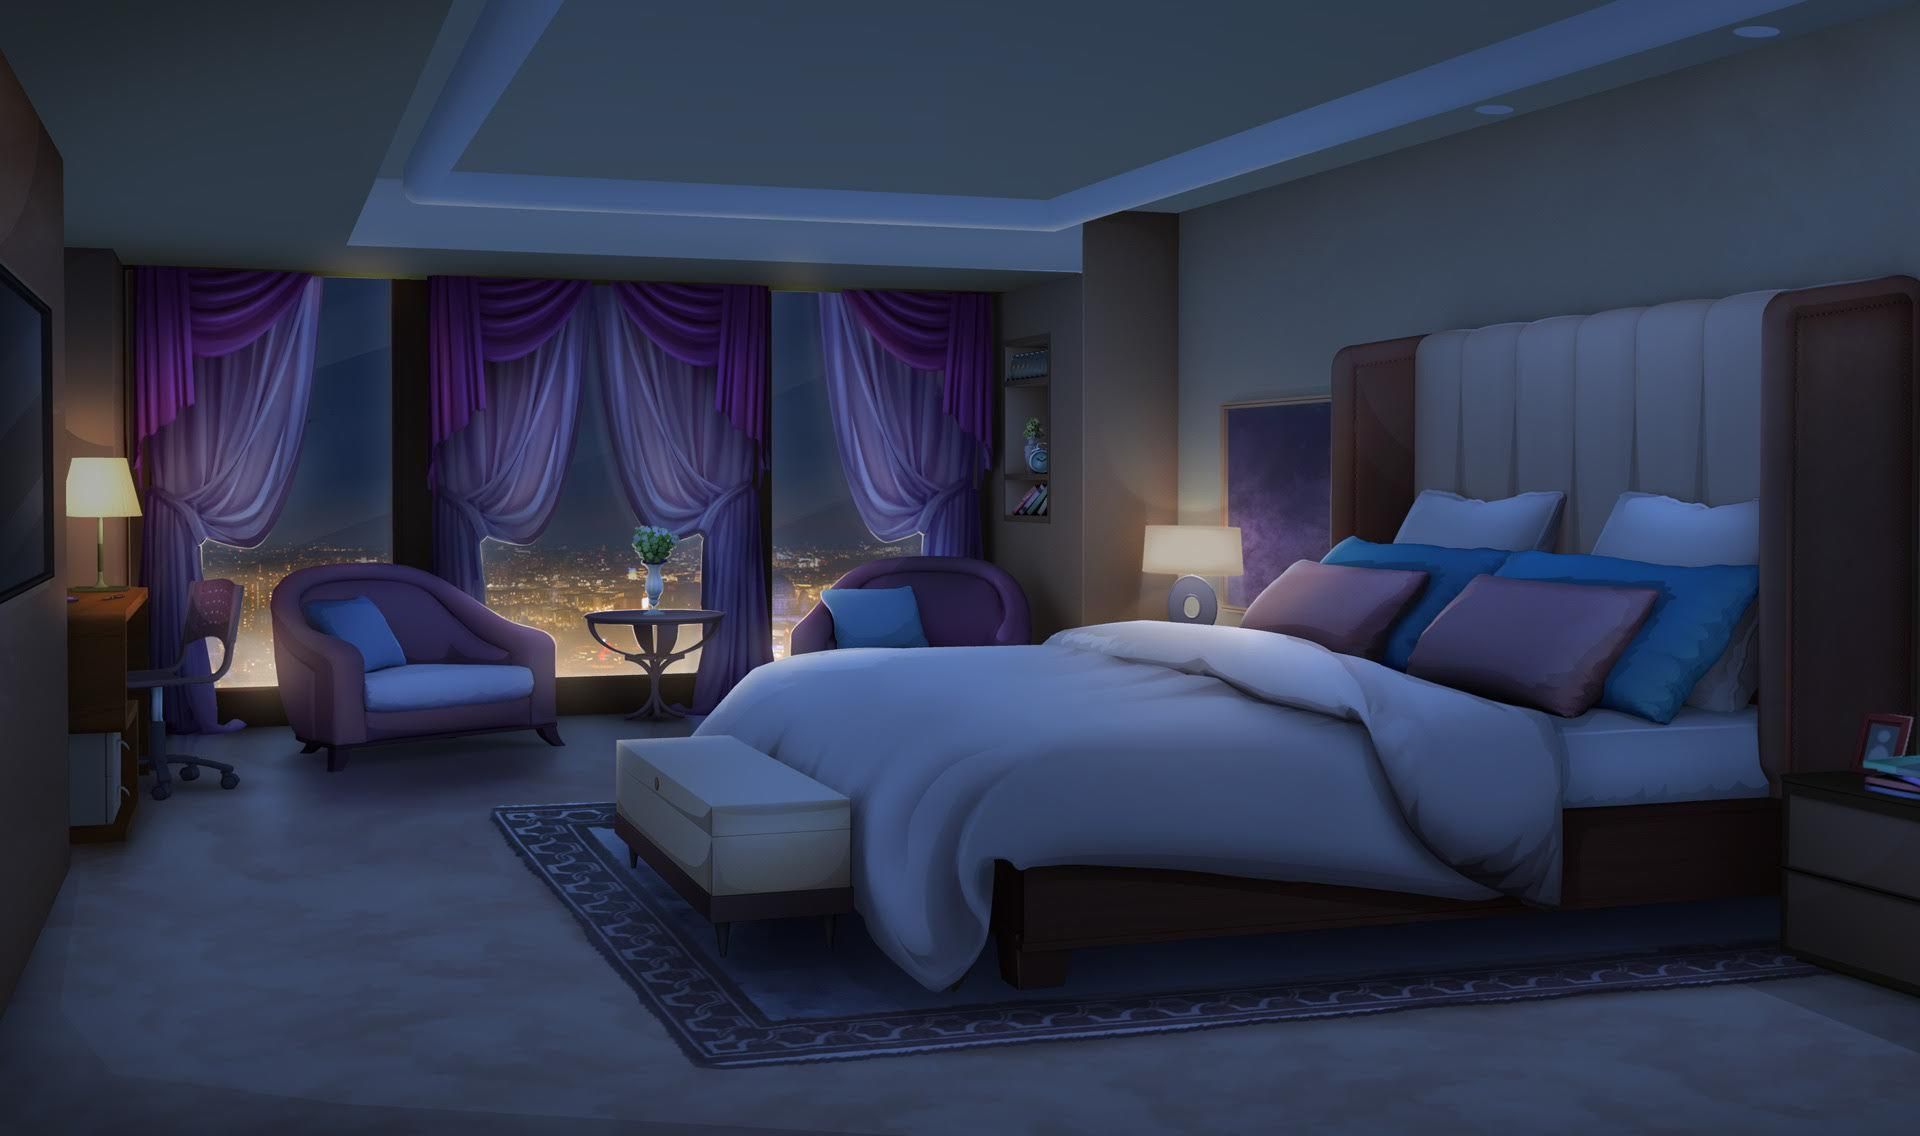 Anime Background Bedroom Dark